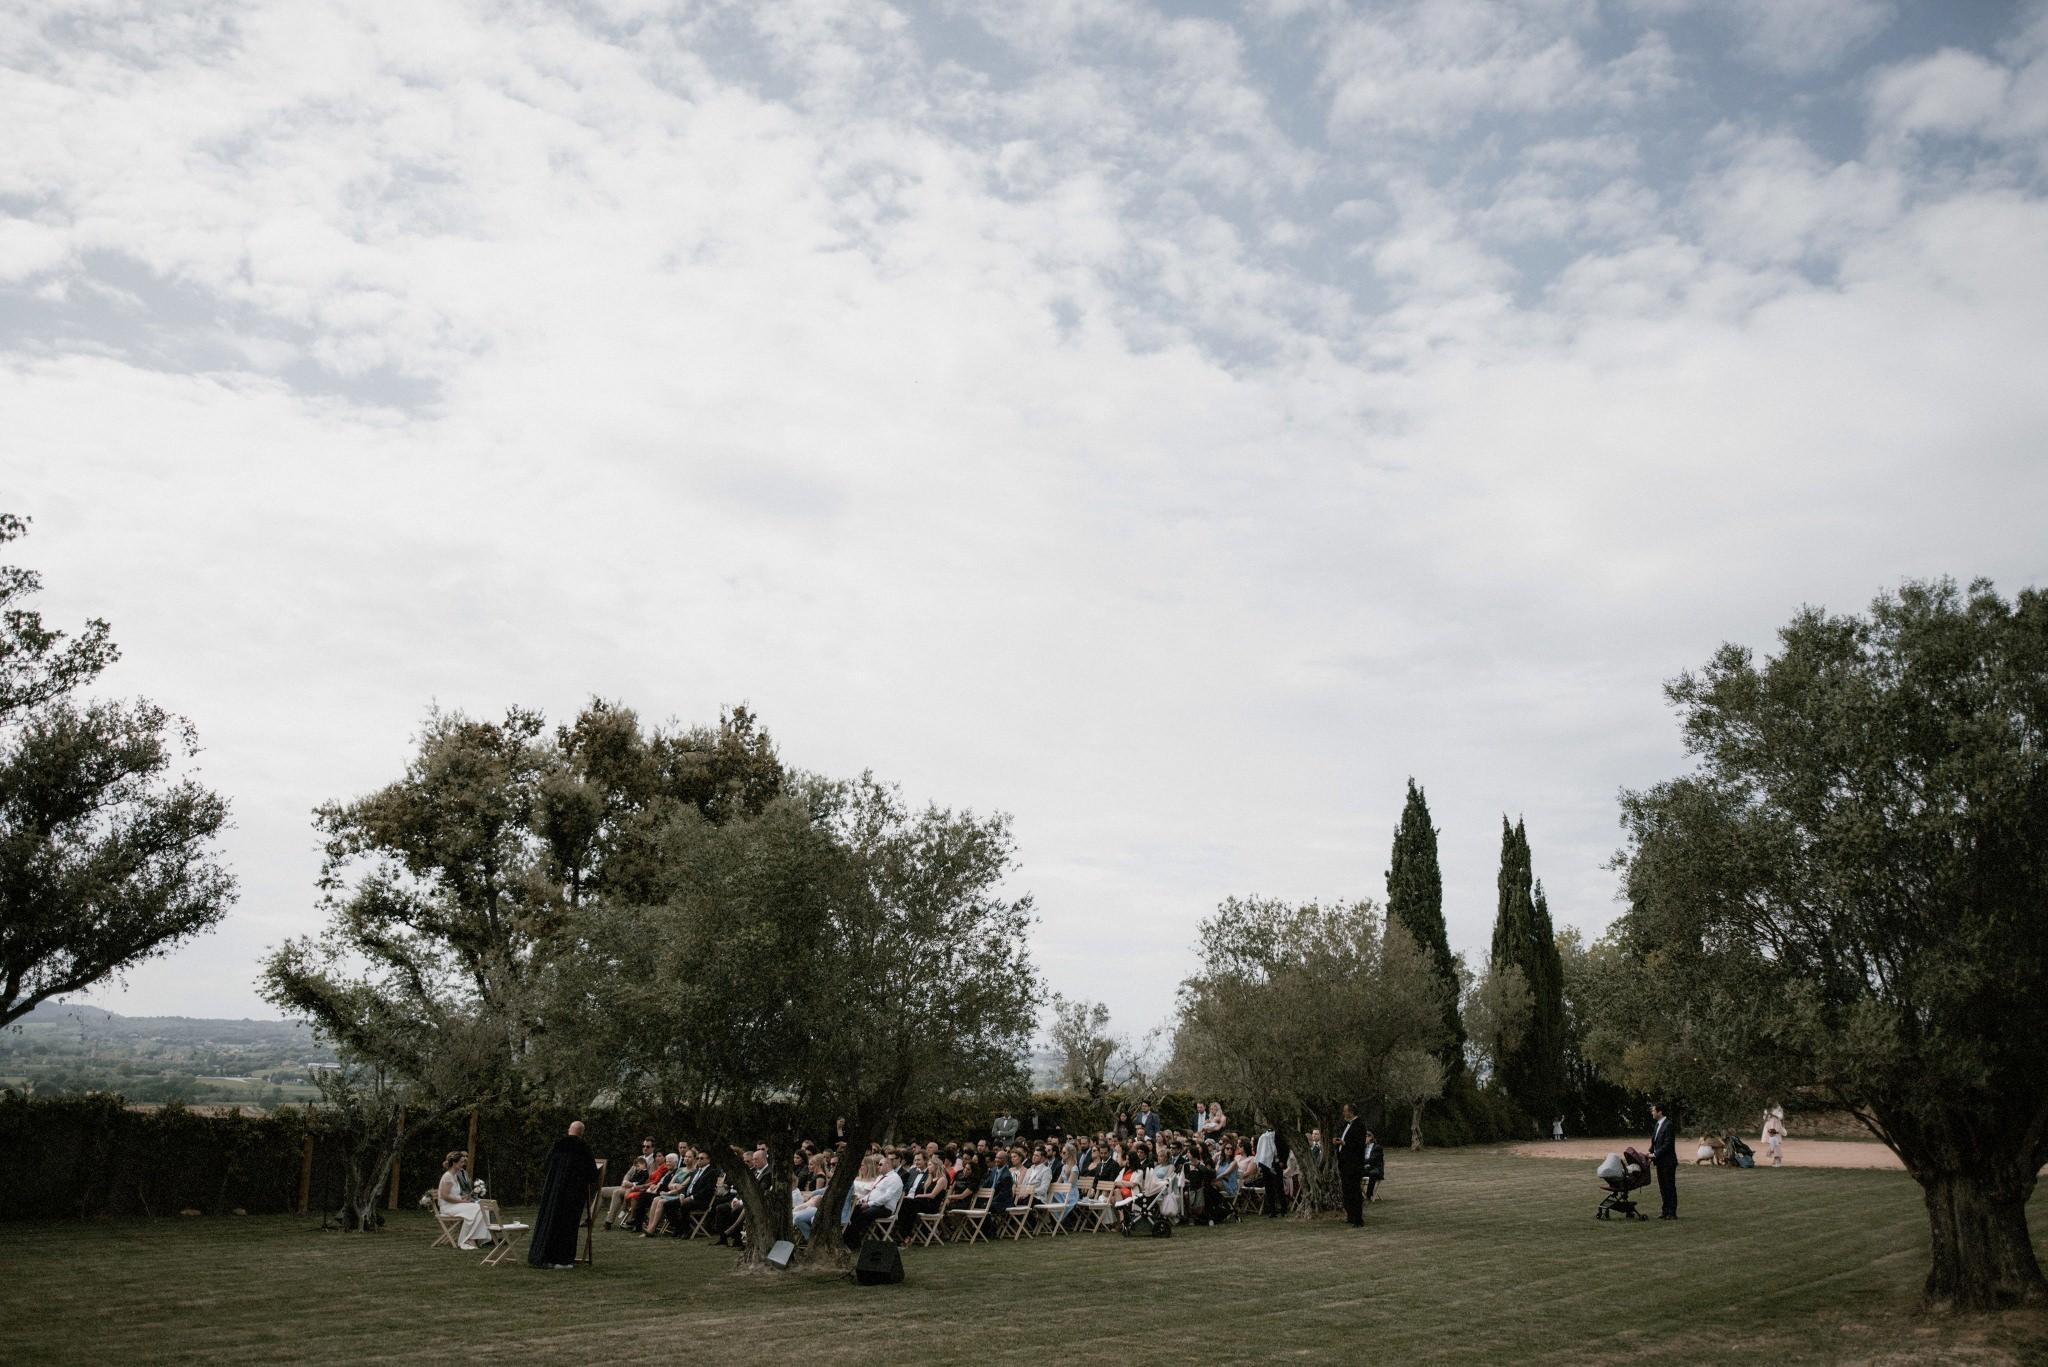 Bruidsfotograaf Spanje Castle d'Emporda destination wedding Naomi van der Kraan00030.jpg